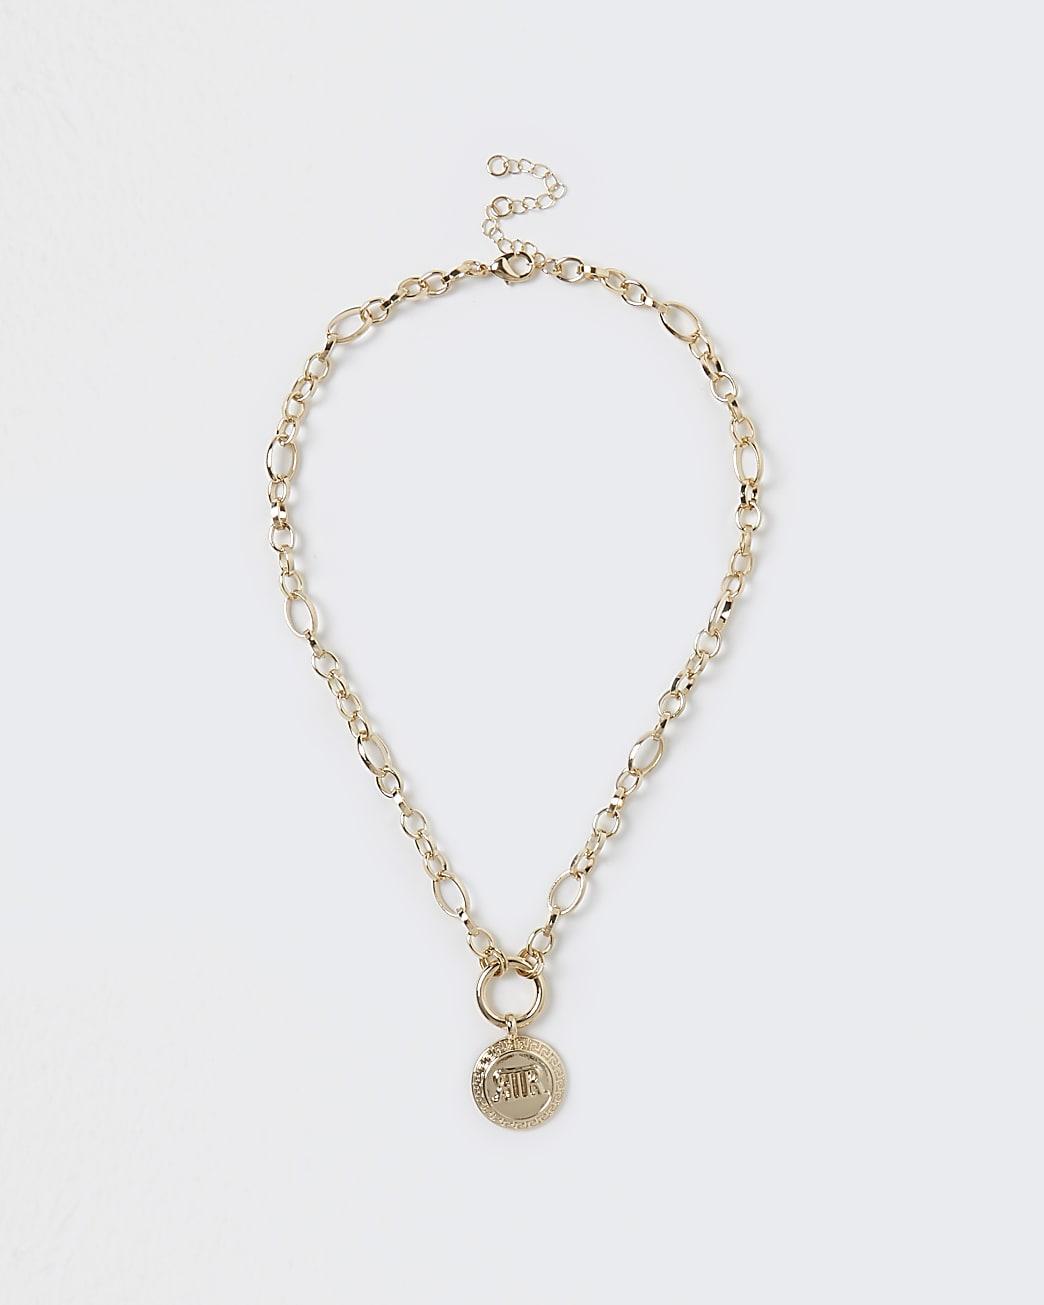 Gold colour 'RIR' coin charm chain necklace